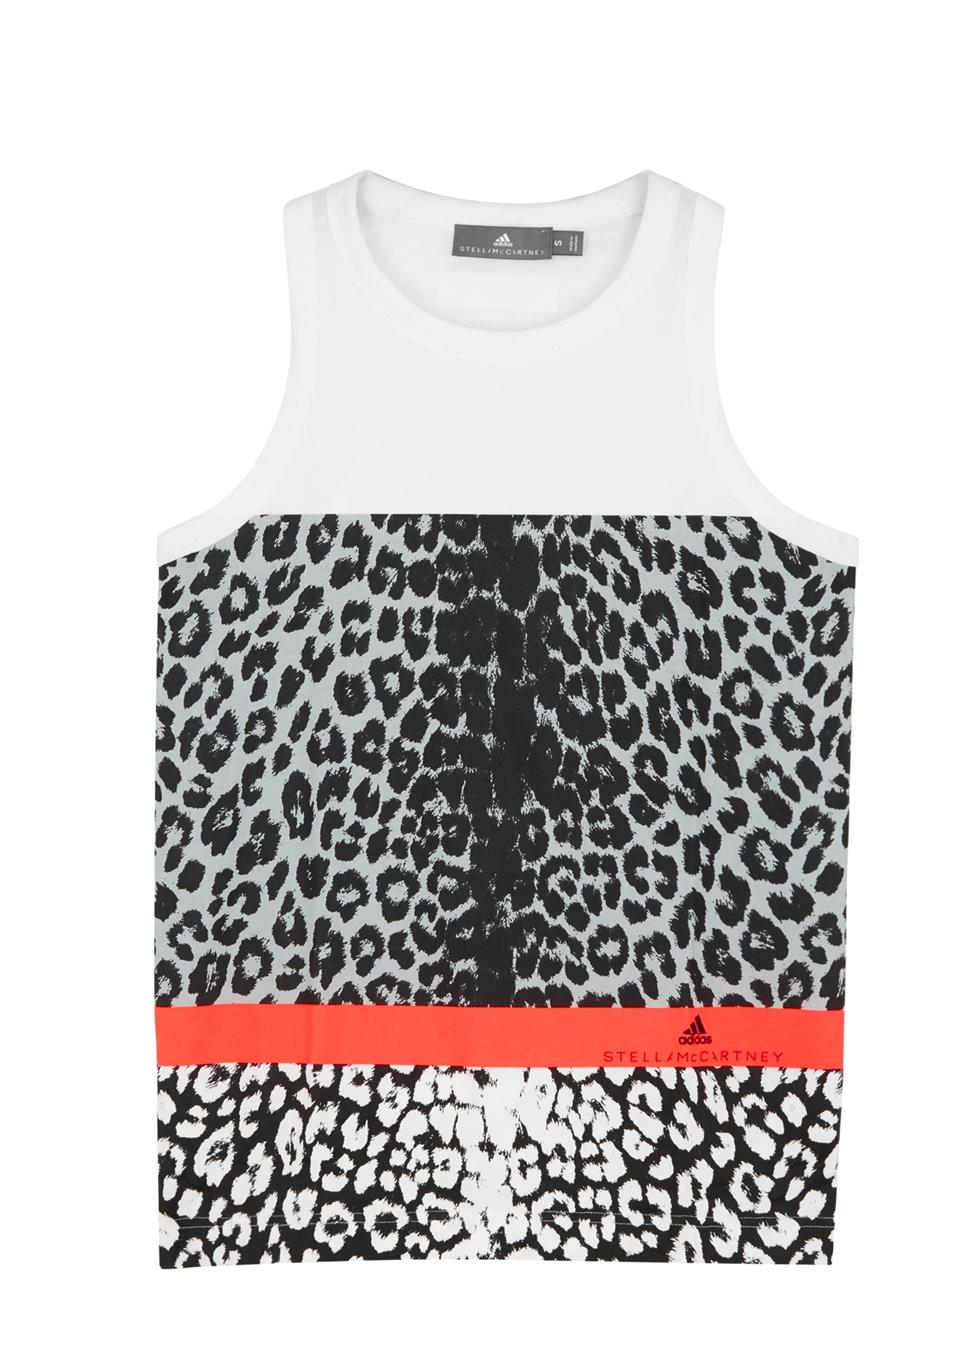 Diseñador de ropa deportiva Adidas x Stella McCartney Harvey Nichols